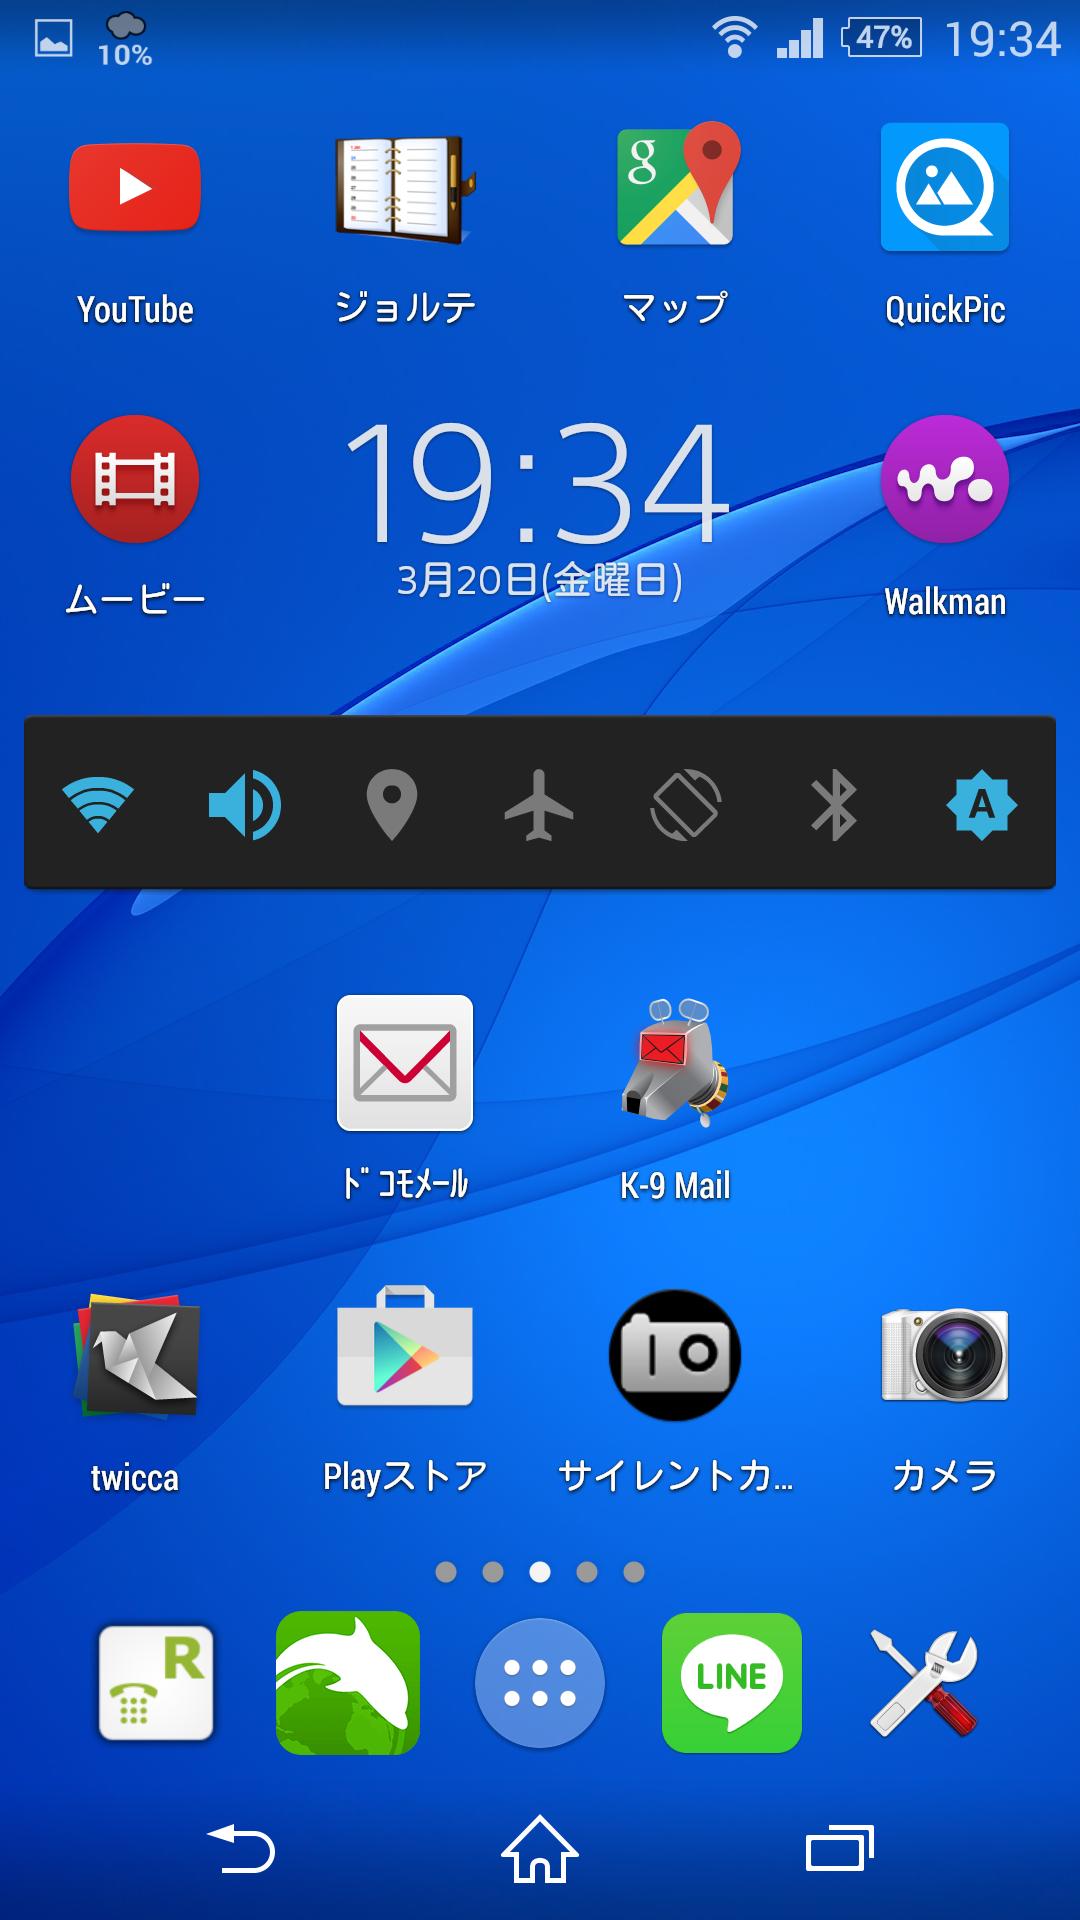 Screenshot_2015-03-20-19-34-22.png